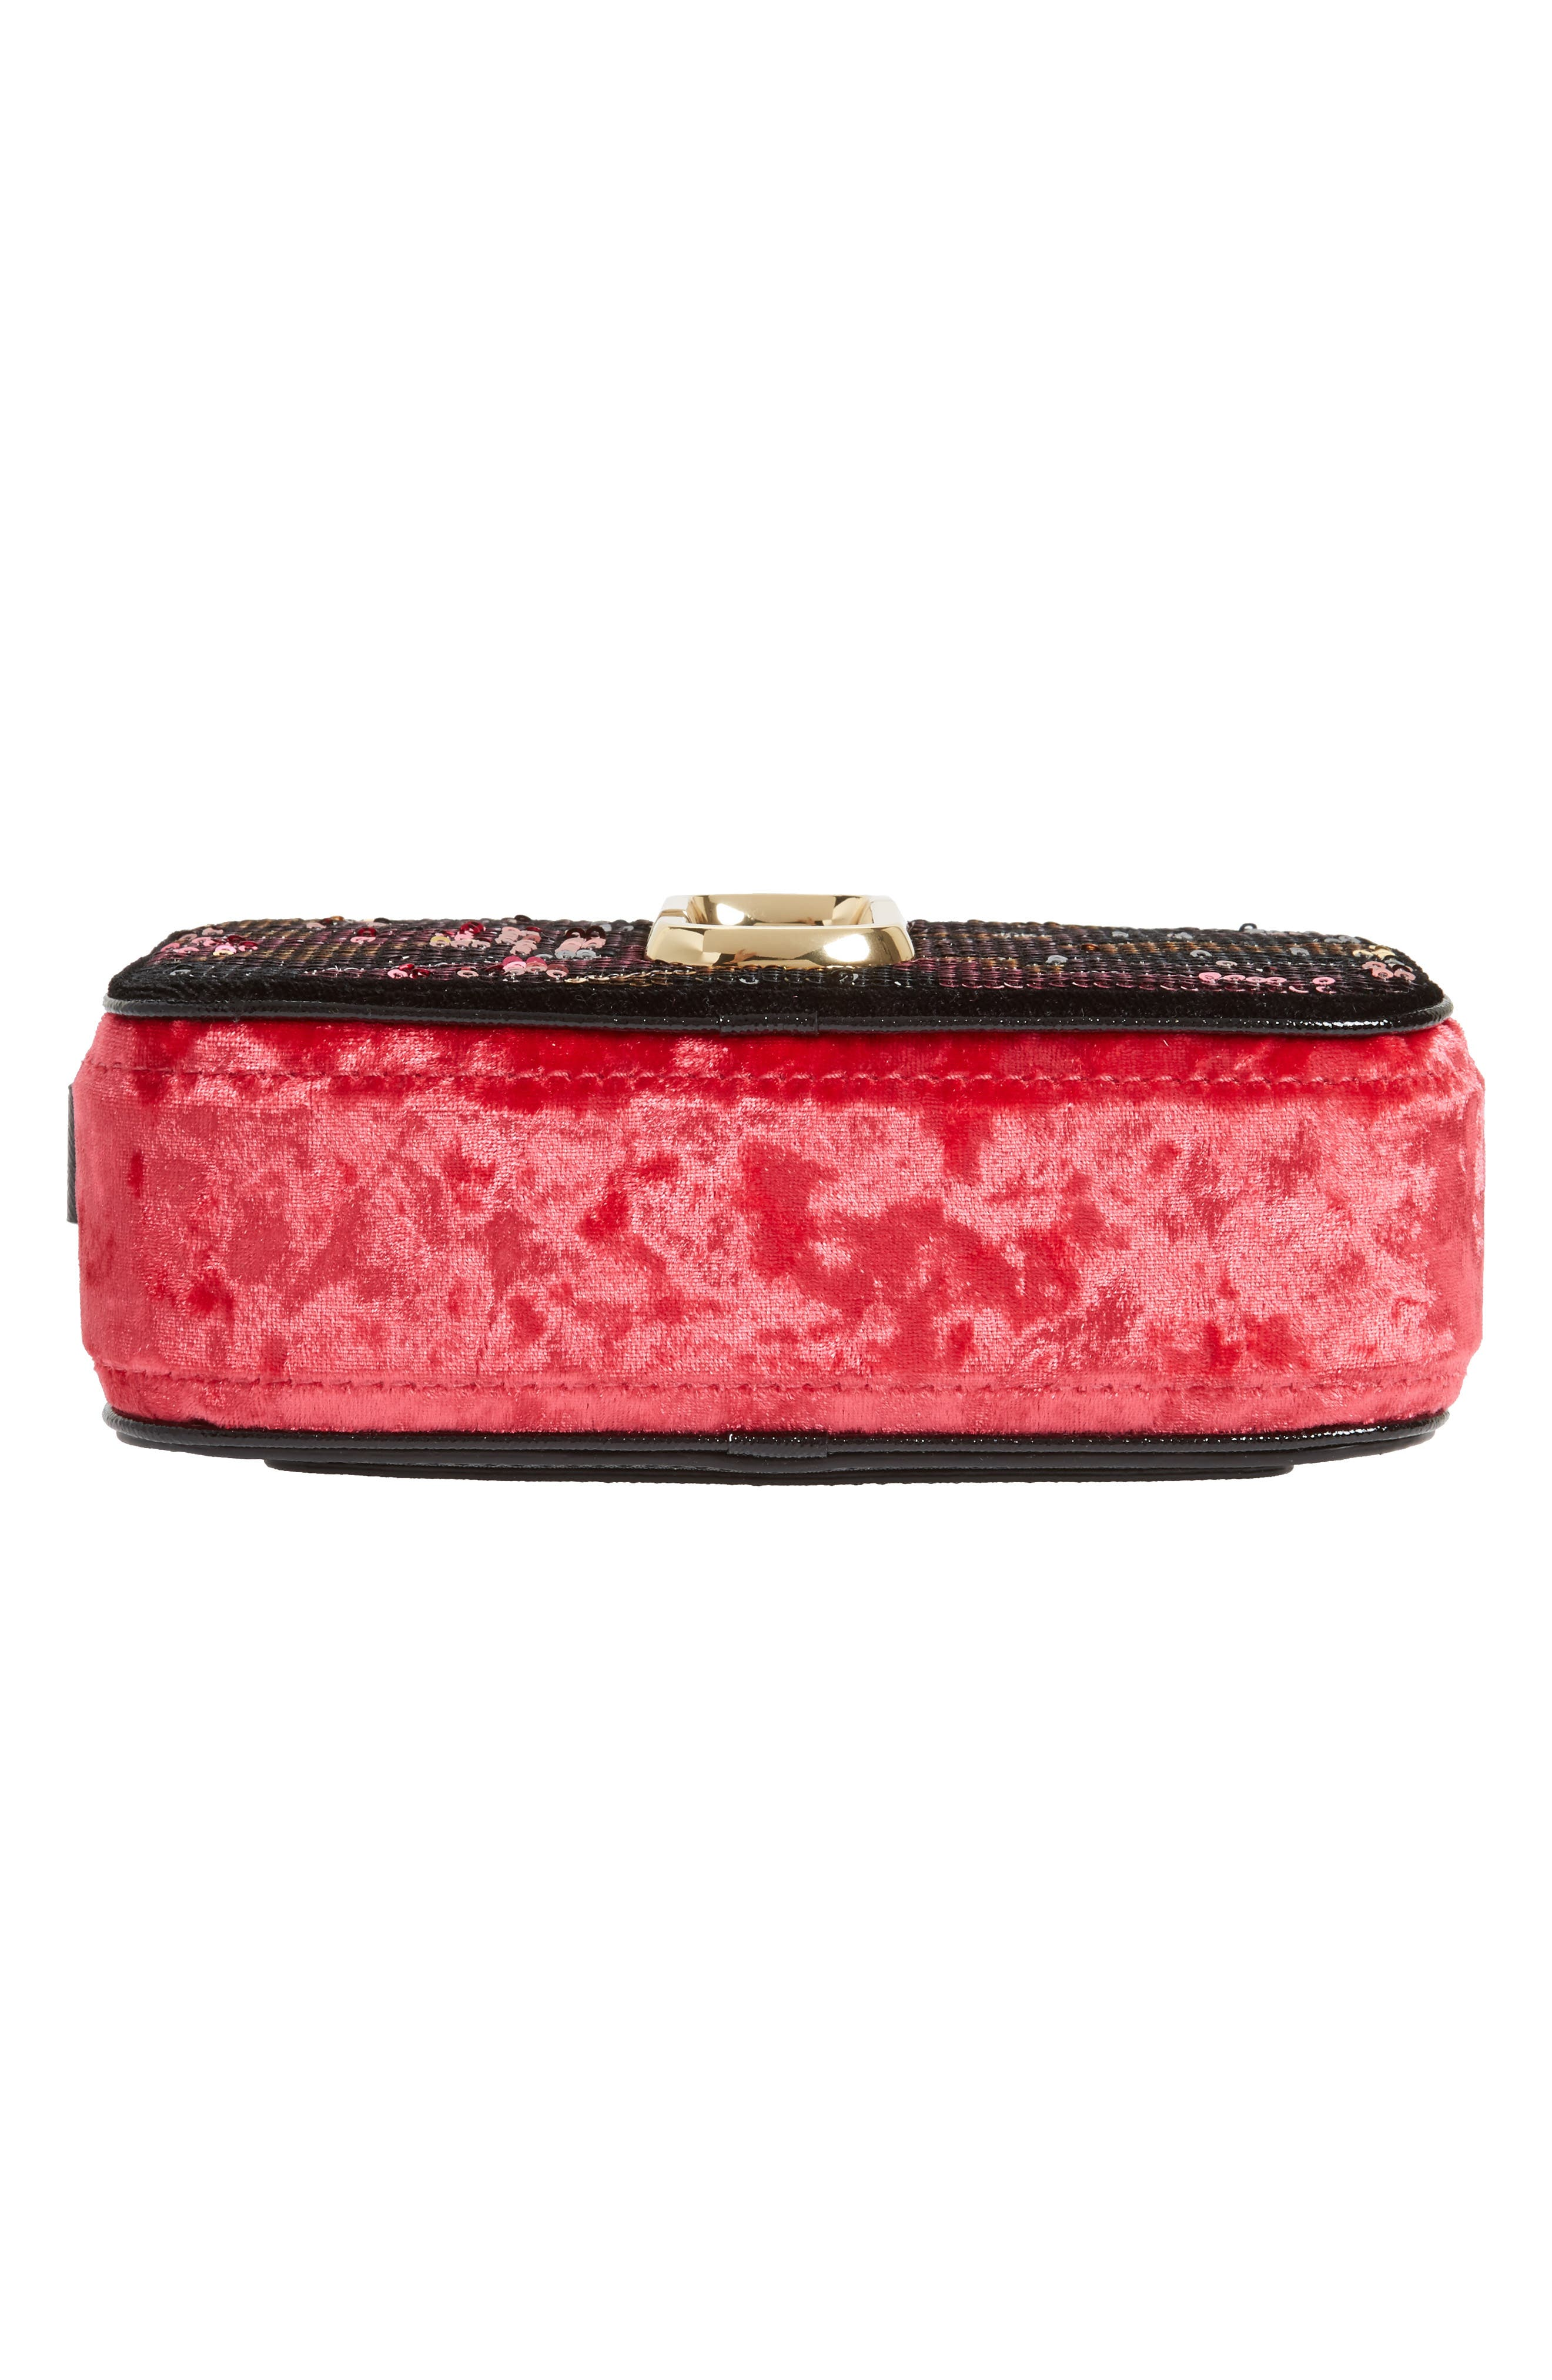 Snapshot Camo Sequin Embellished Crossbody Bag,                             Alternate thumbnail 6, color,                             Pink Multi